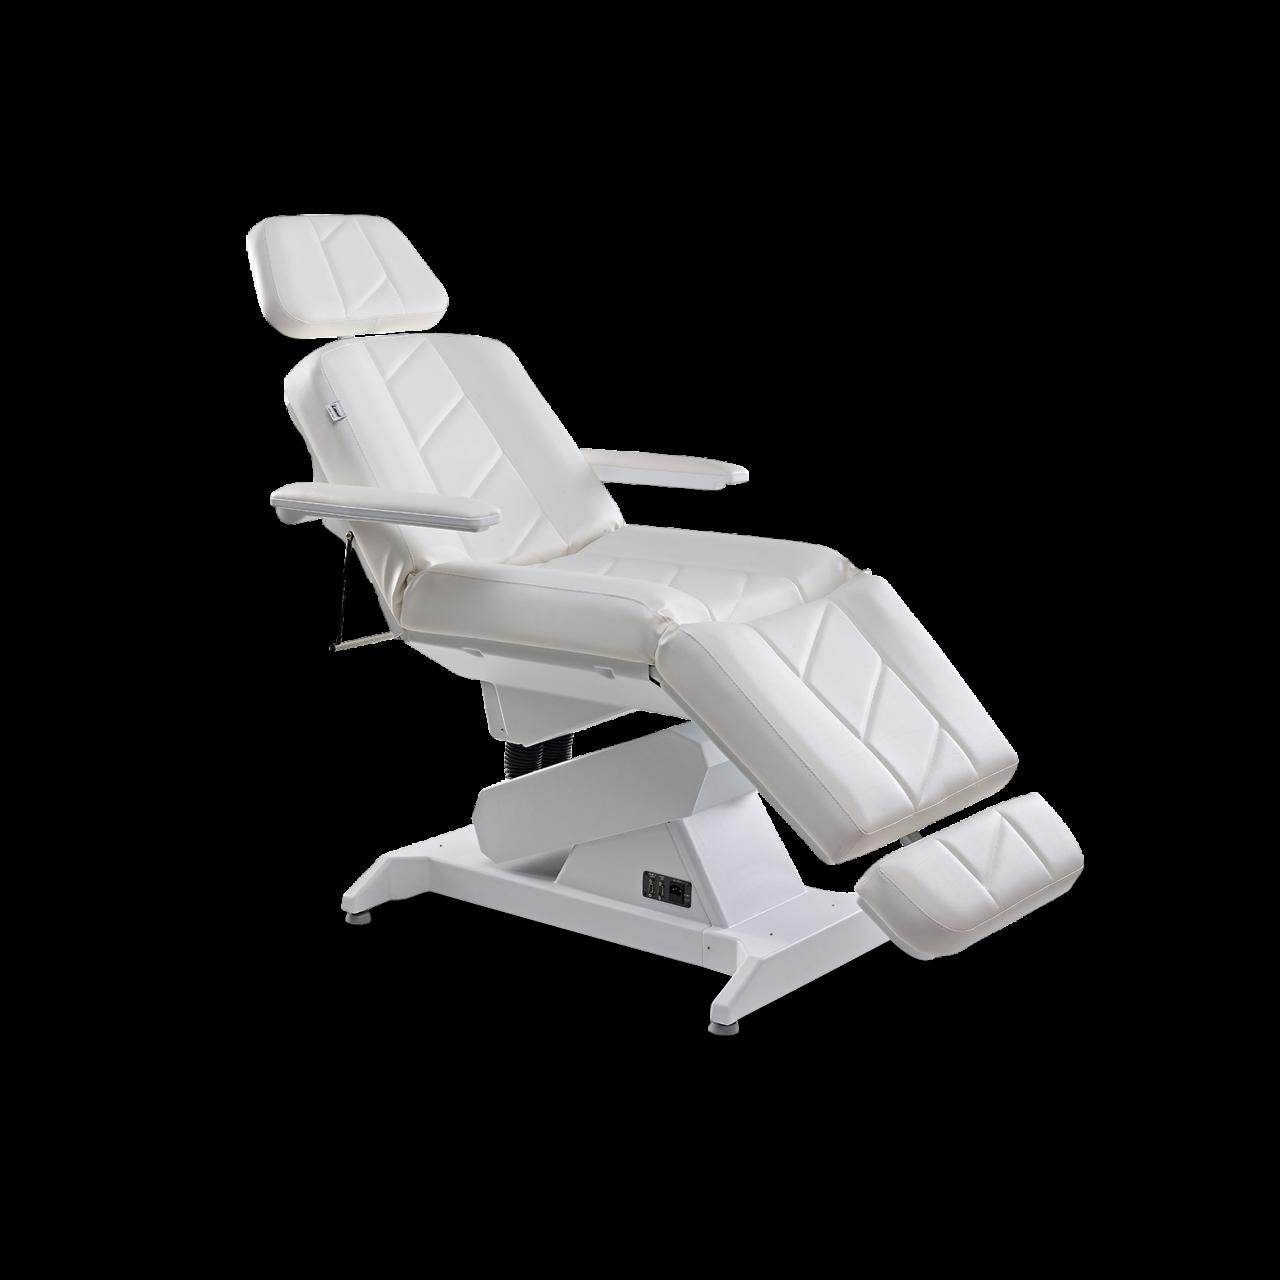 Kosmetikliege DIAMANT, weiß, 3 Motoren Heizung, Sockel in weiß